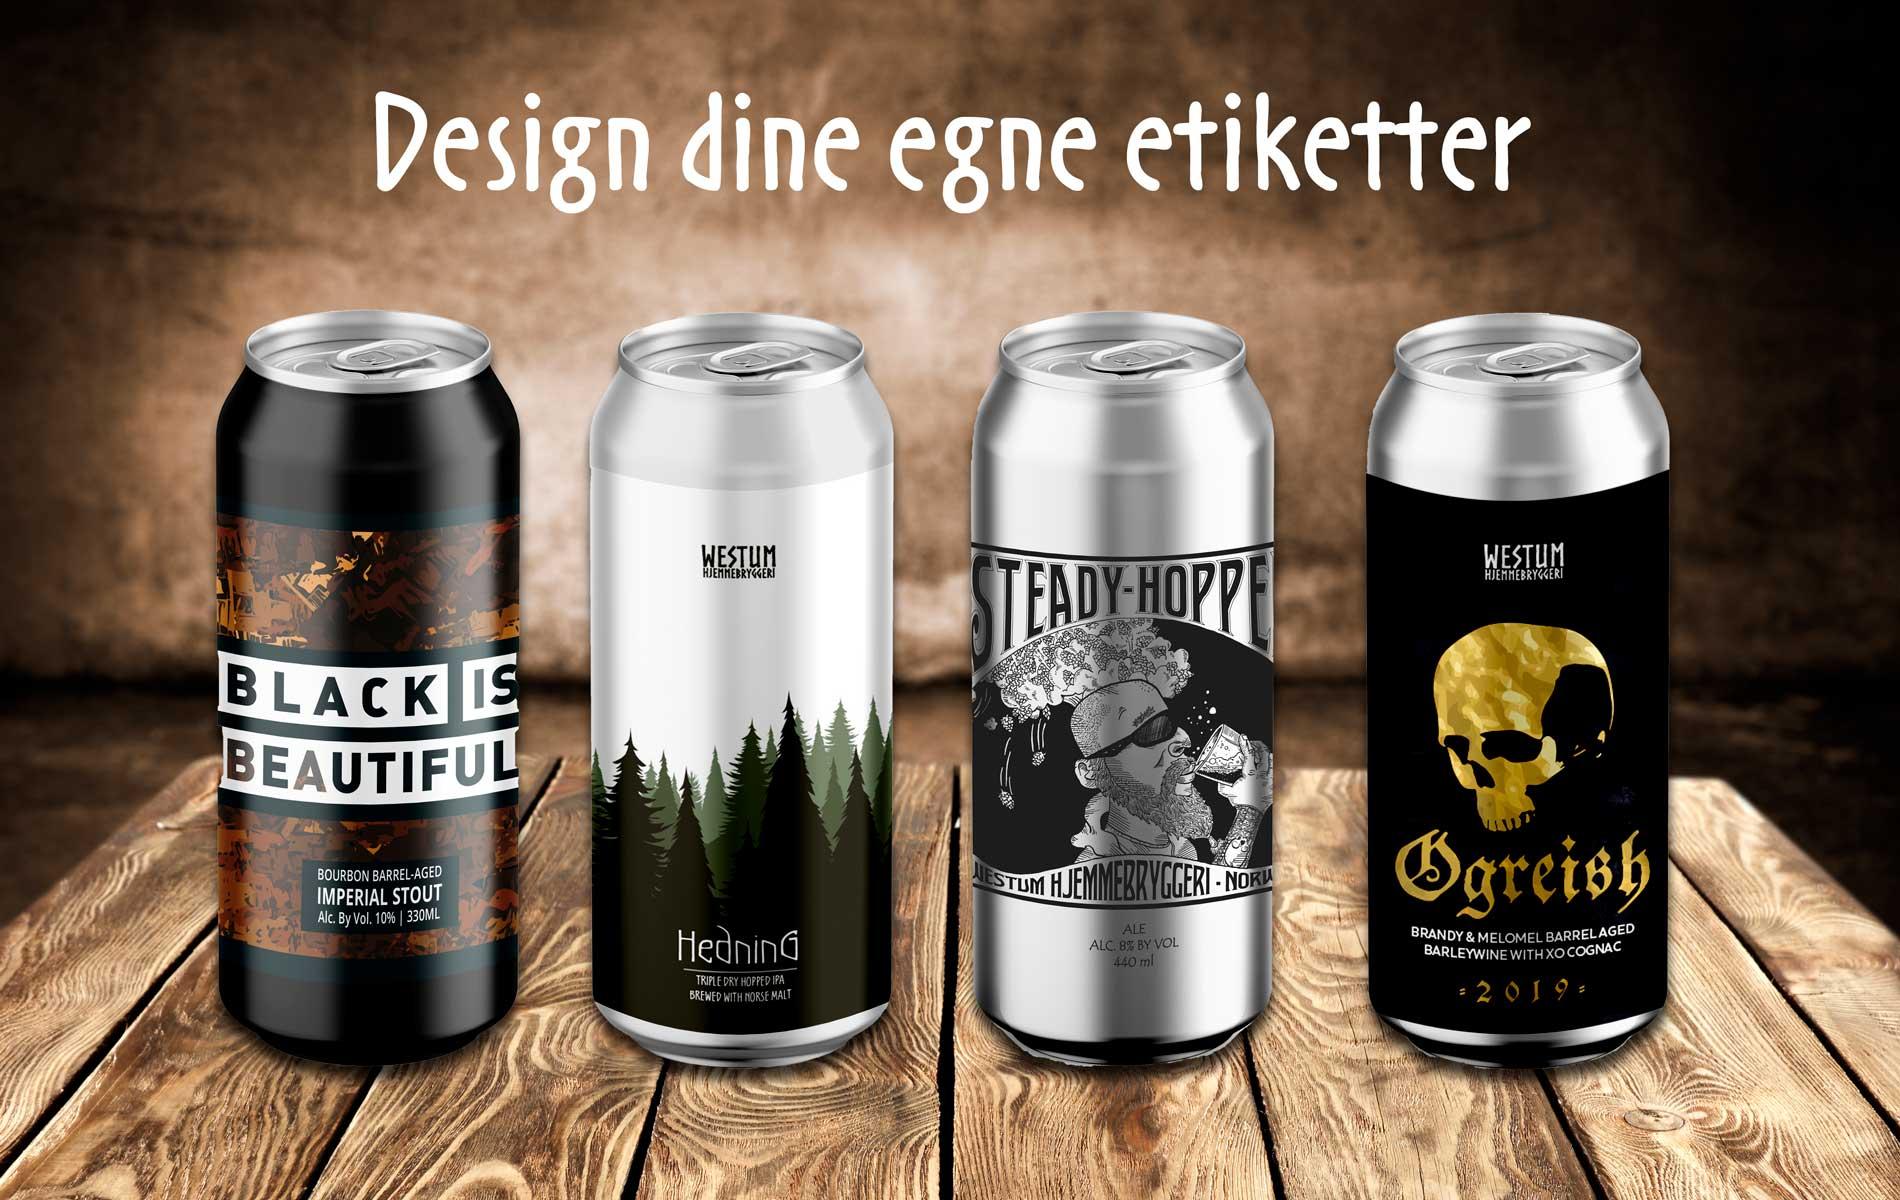 Design dine egne etiketter